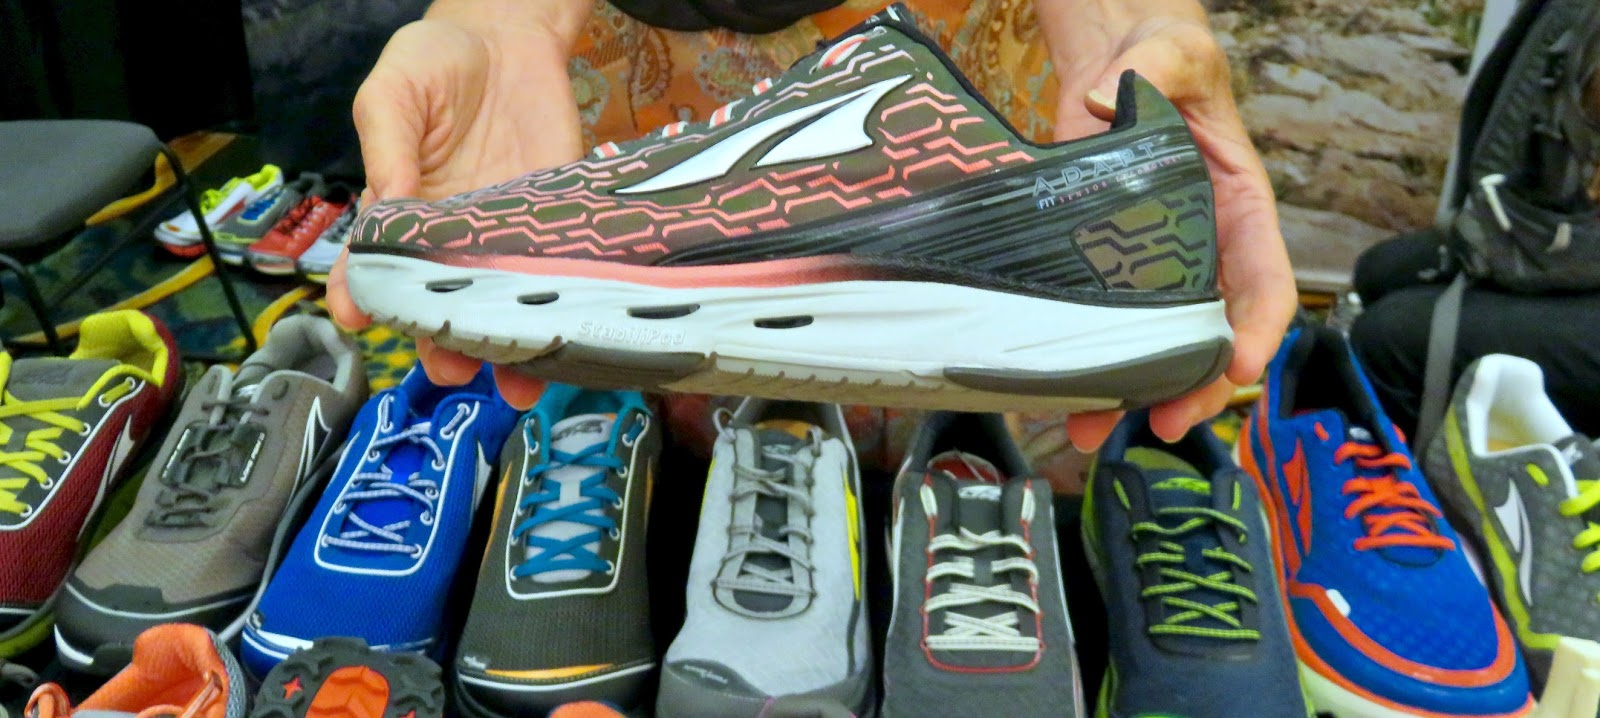 scarpe running nike con sensore